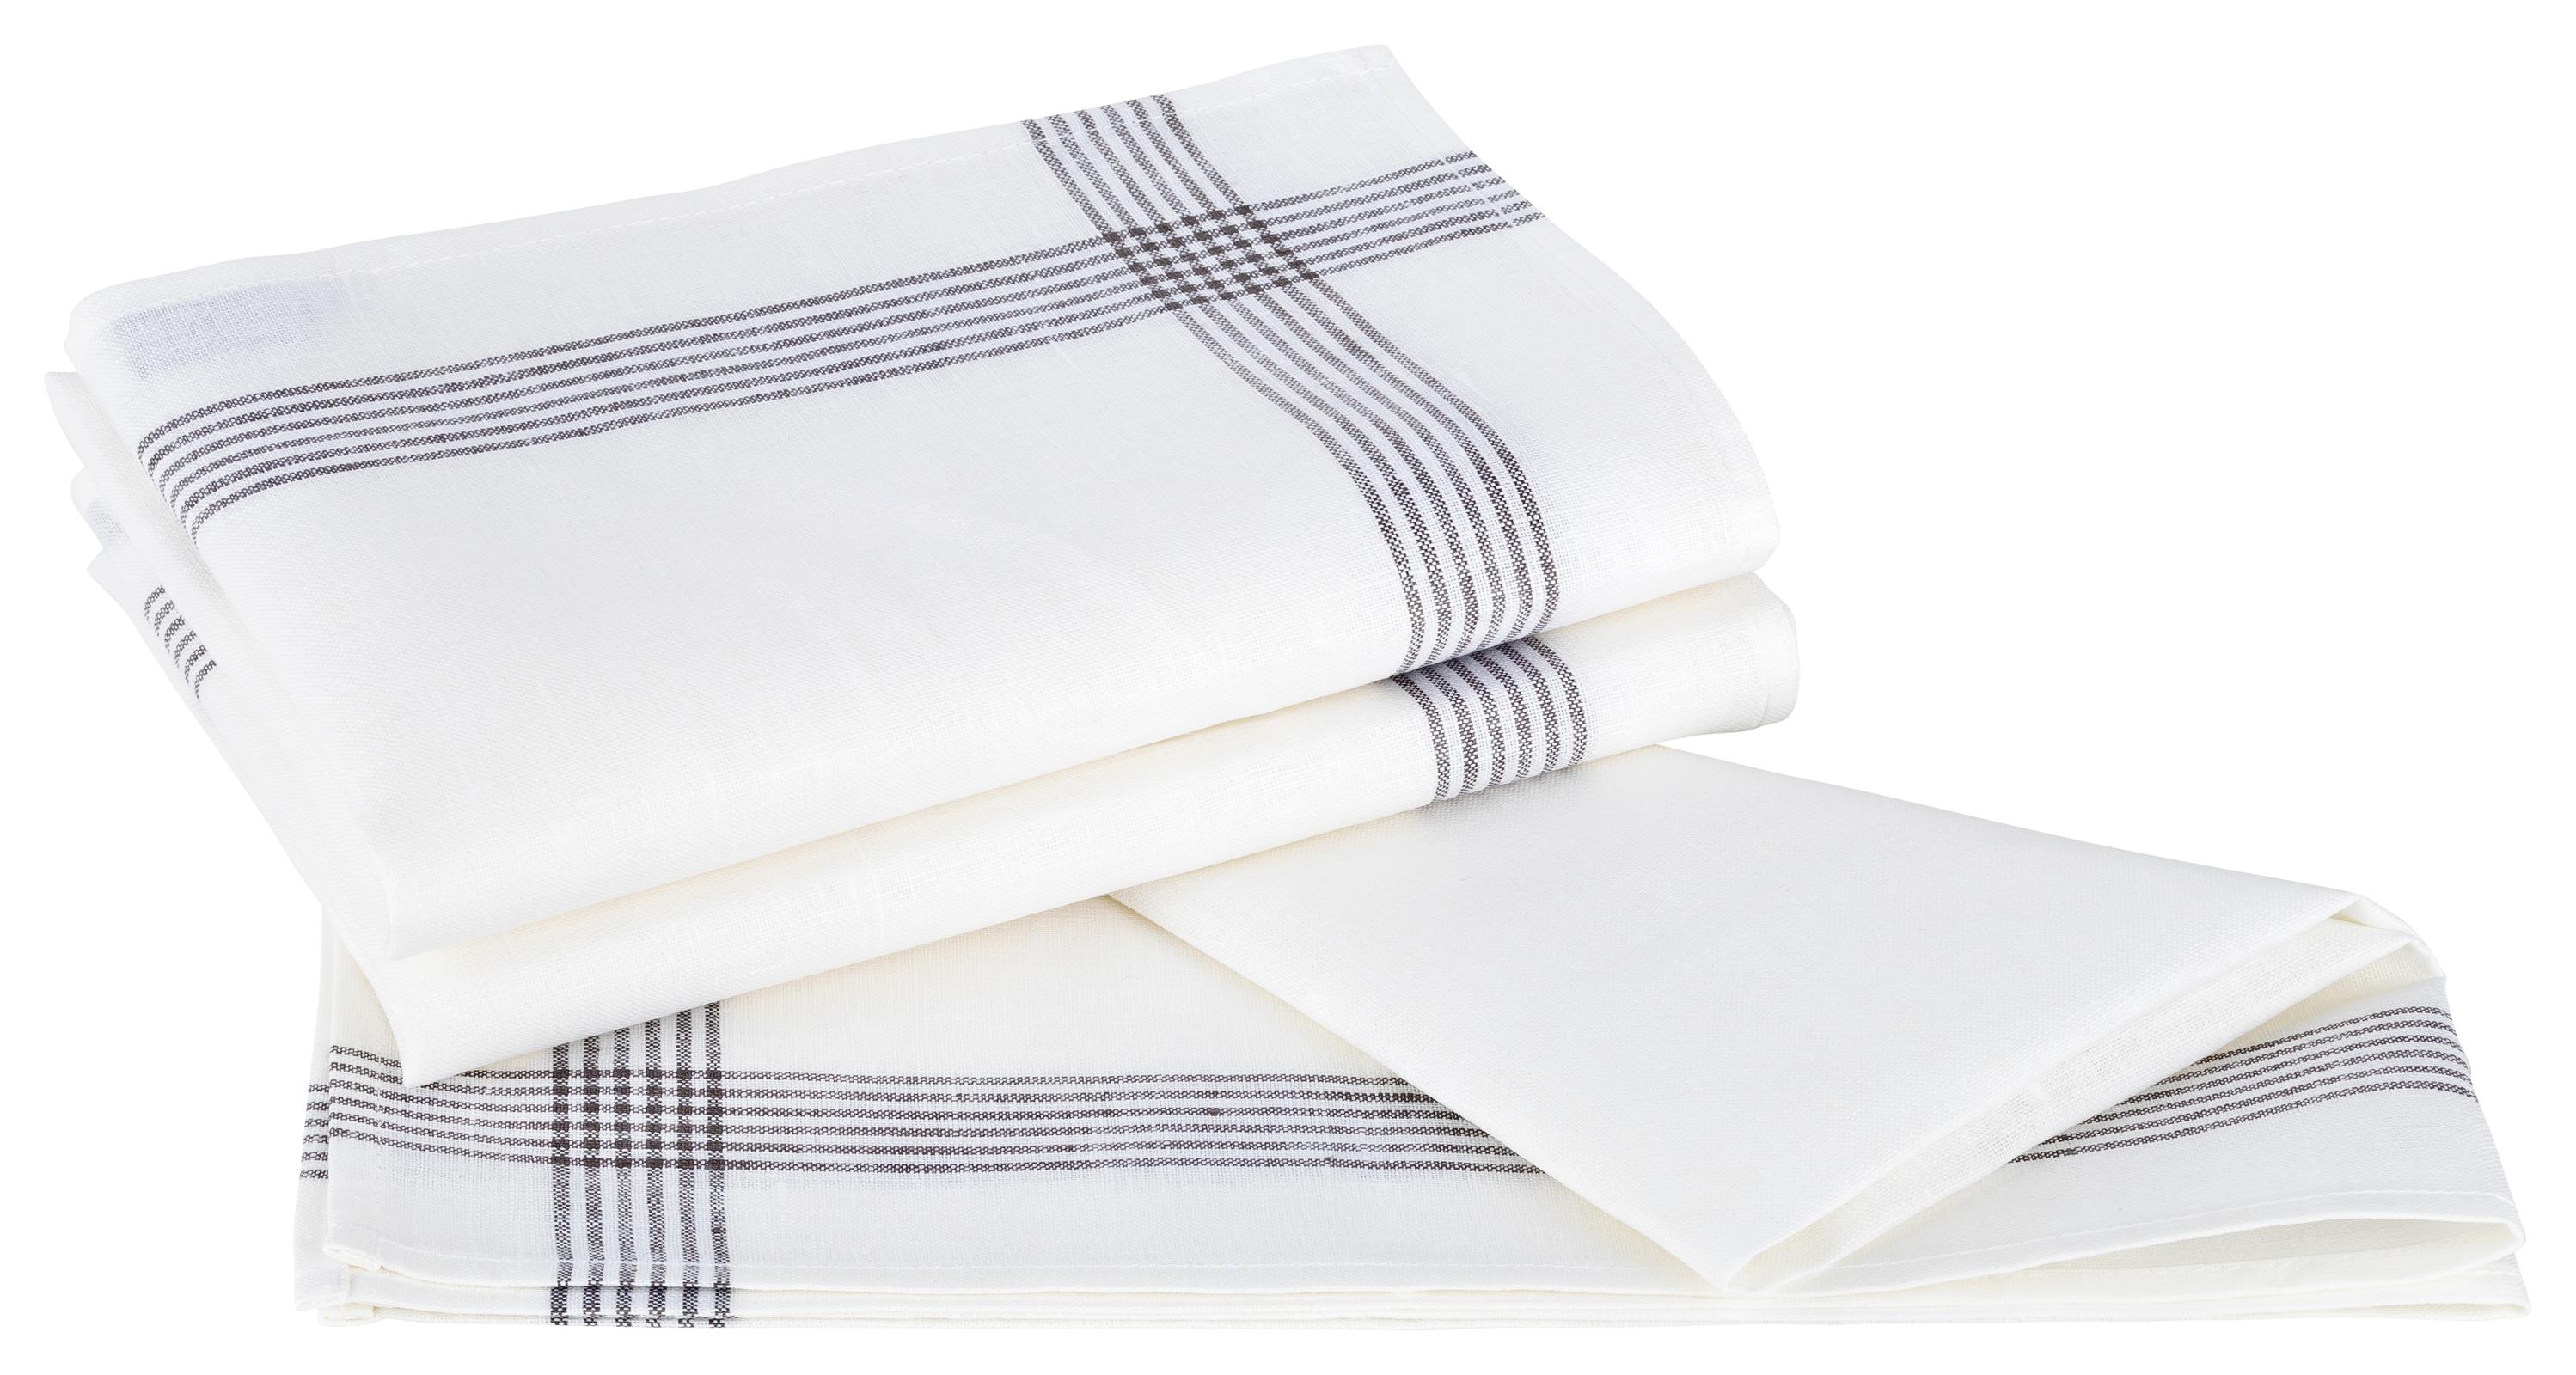 Küchentextilien - Kracht 3er Pack Geschirrtücher Gläsertücher 100 Leinen Reinleinen 50x70 Rahmen 2 263 18 weiß grau  - Onlineshop PremiumShop321